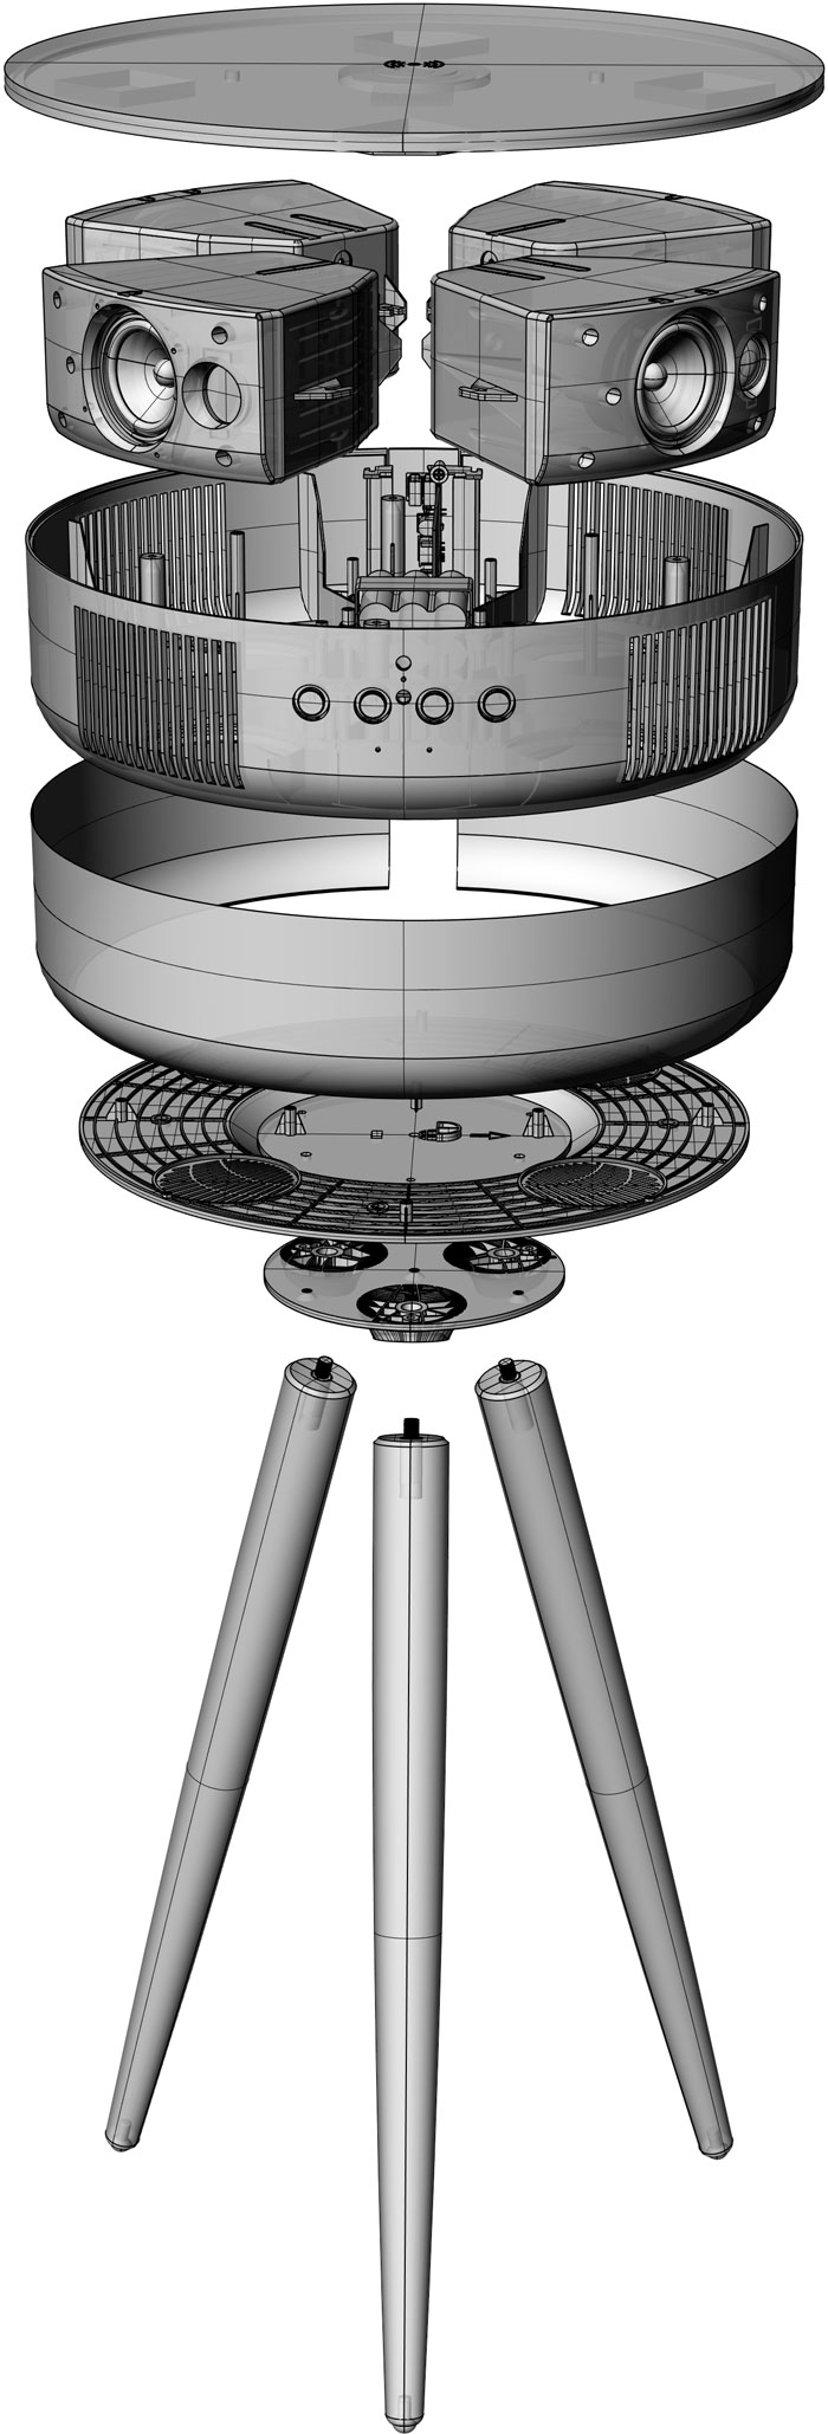 Sinox SXBT1502 Bluetooth-højtaler og bord